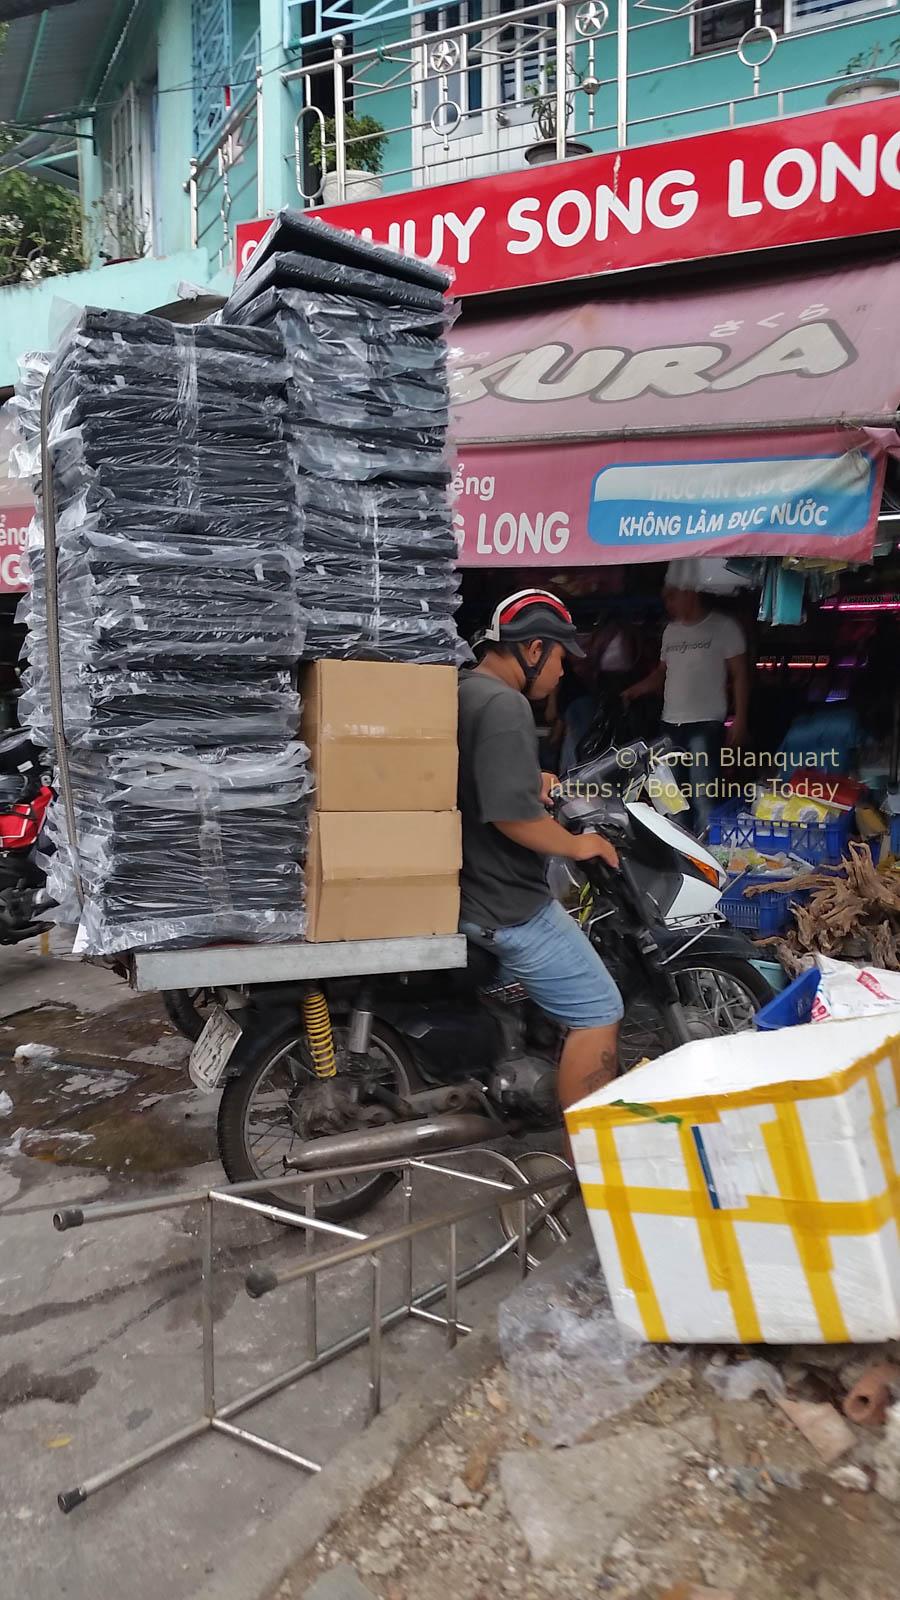 20170125-2017-01-25 15.07.29Ho Chi Minh City, Saigon, Vietnam by Koen Blanquart for Boarding.Today.jpg